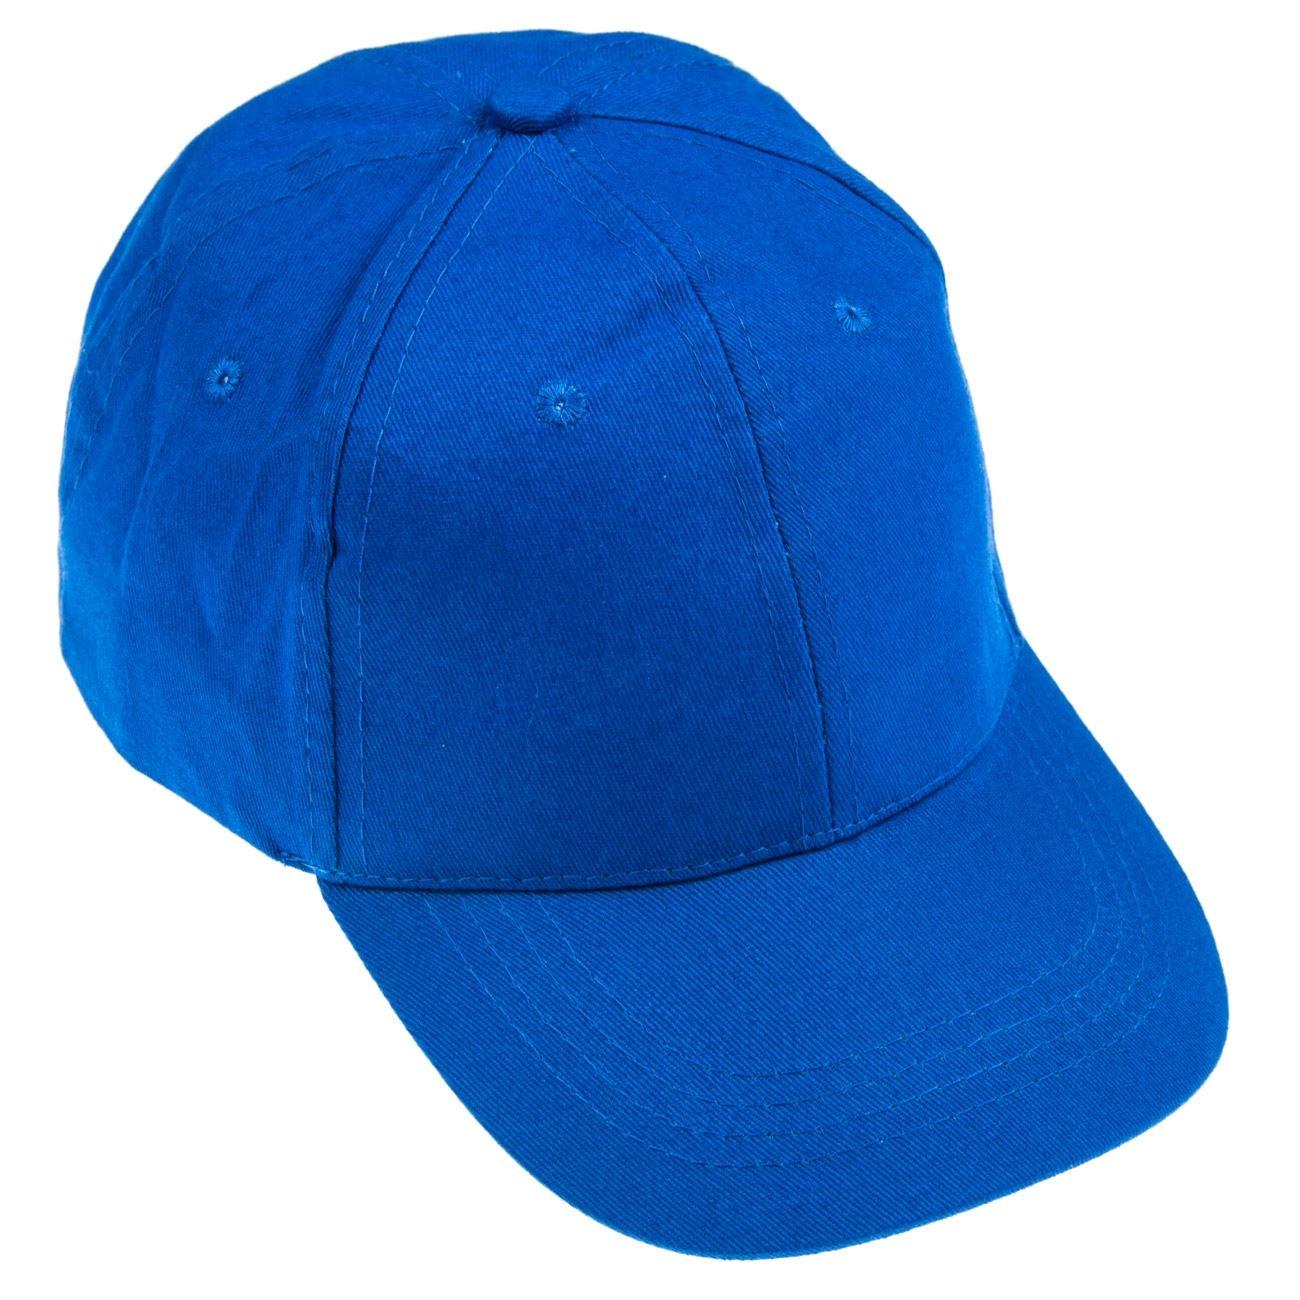 46b445df476 Τζόκευ Παιδικό Μπλε Ρουά < Καπέλα Jockey Παιδικά Για Αγόρια   Jumbo